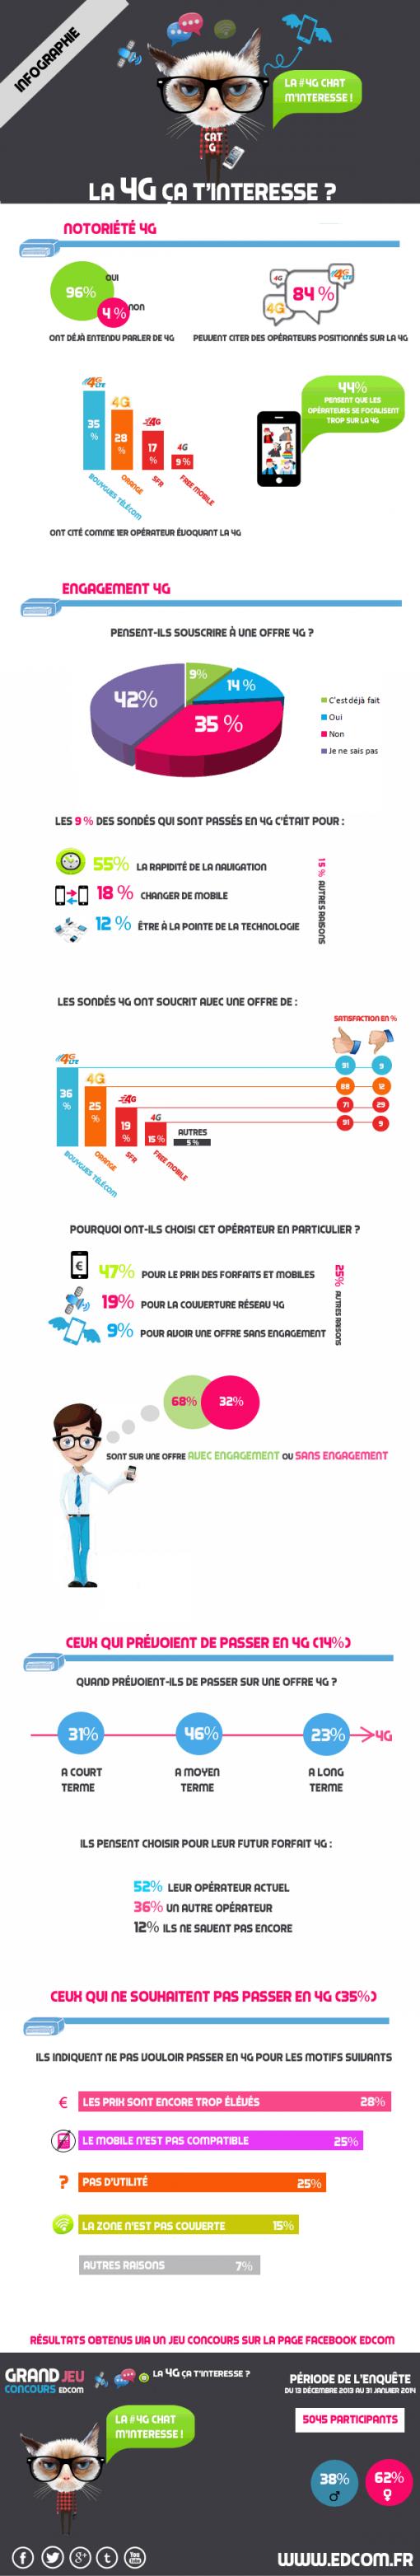 4G France infographie